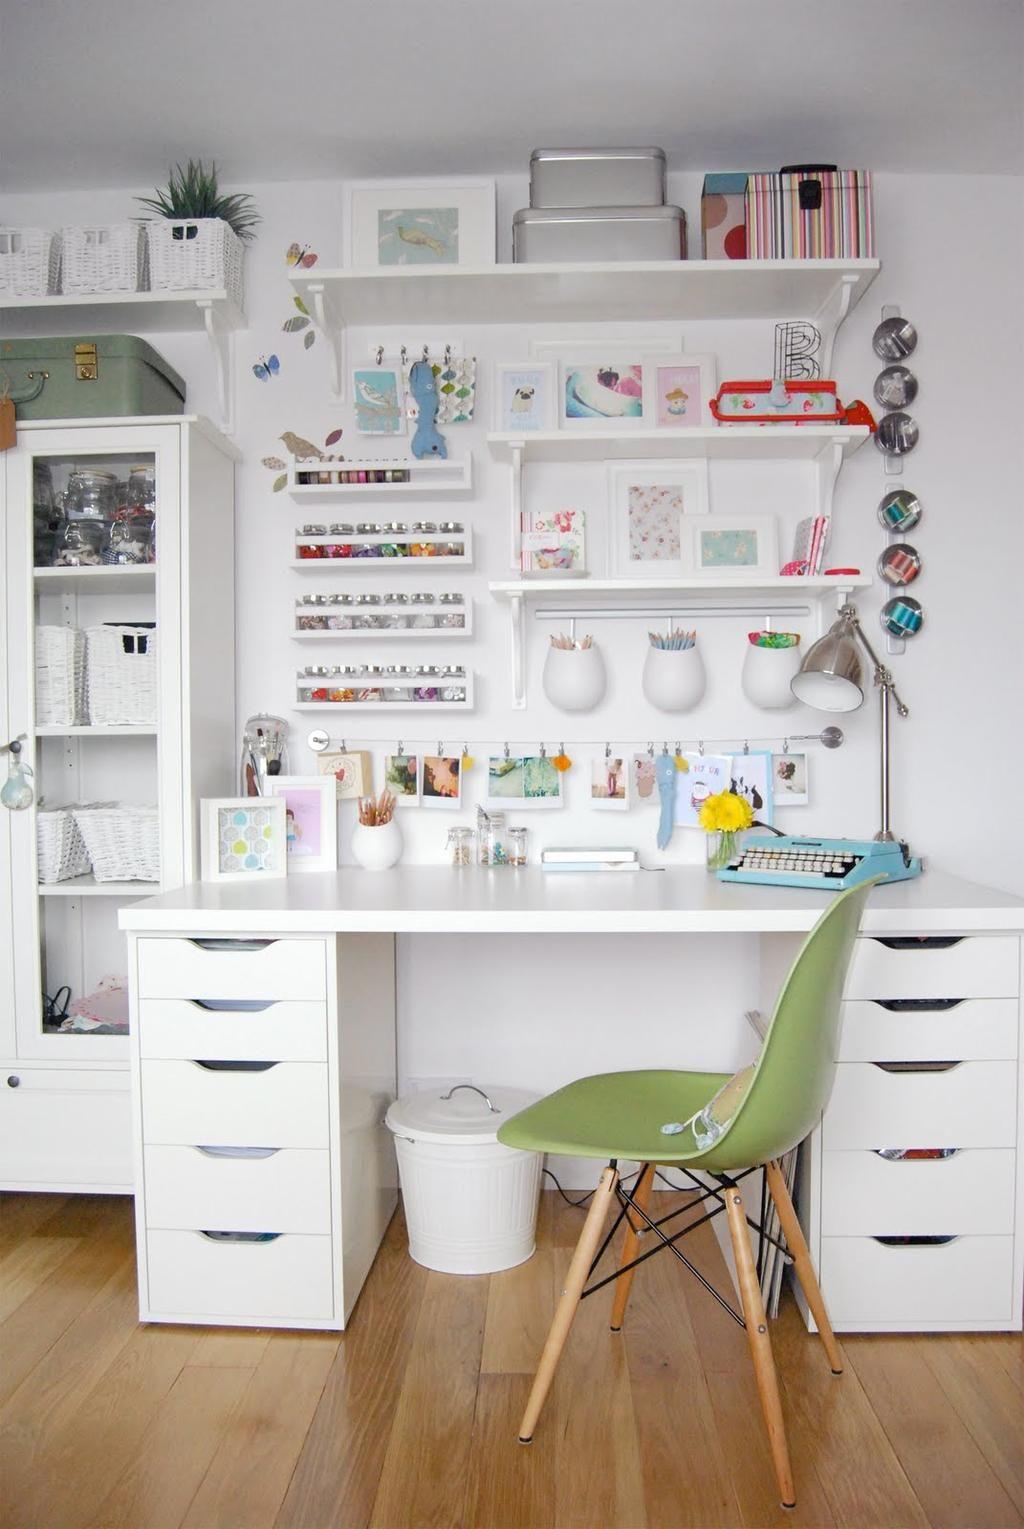 Craft room at rosehipsandpetticoats.blogspot.co.uk IKEA http://www.ikea.com/hu/hu/catalog/products/40342285/#/10192824